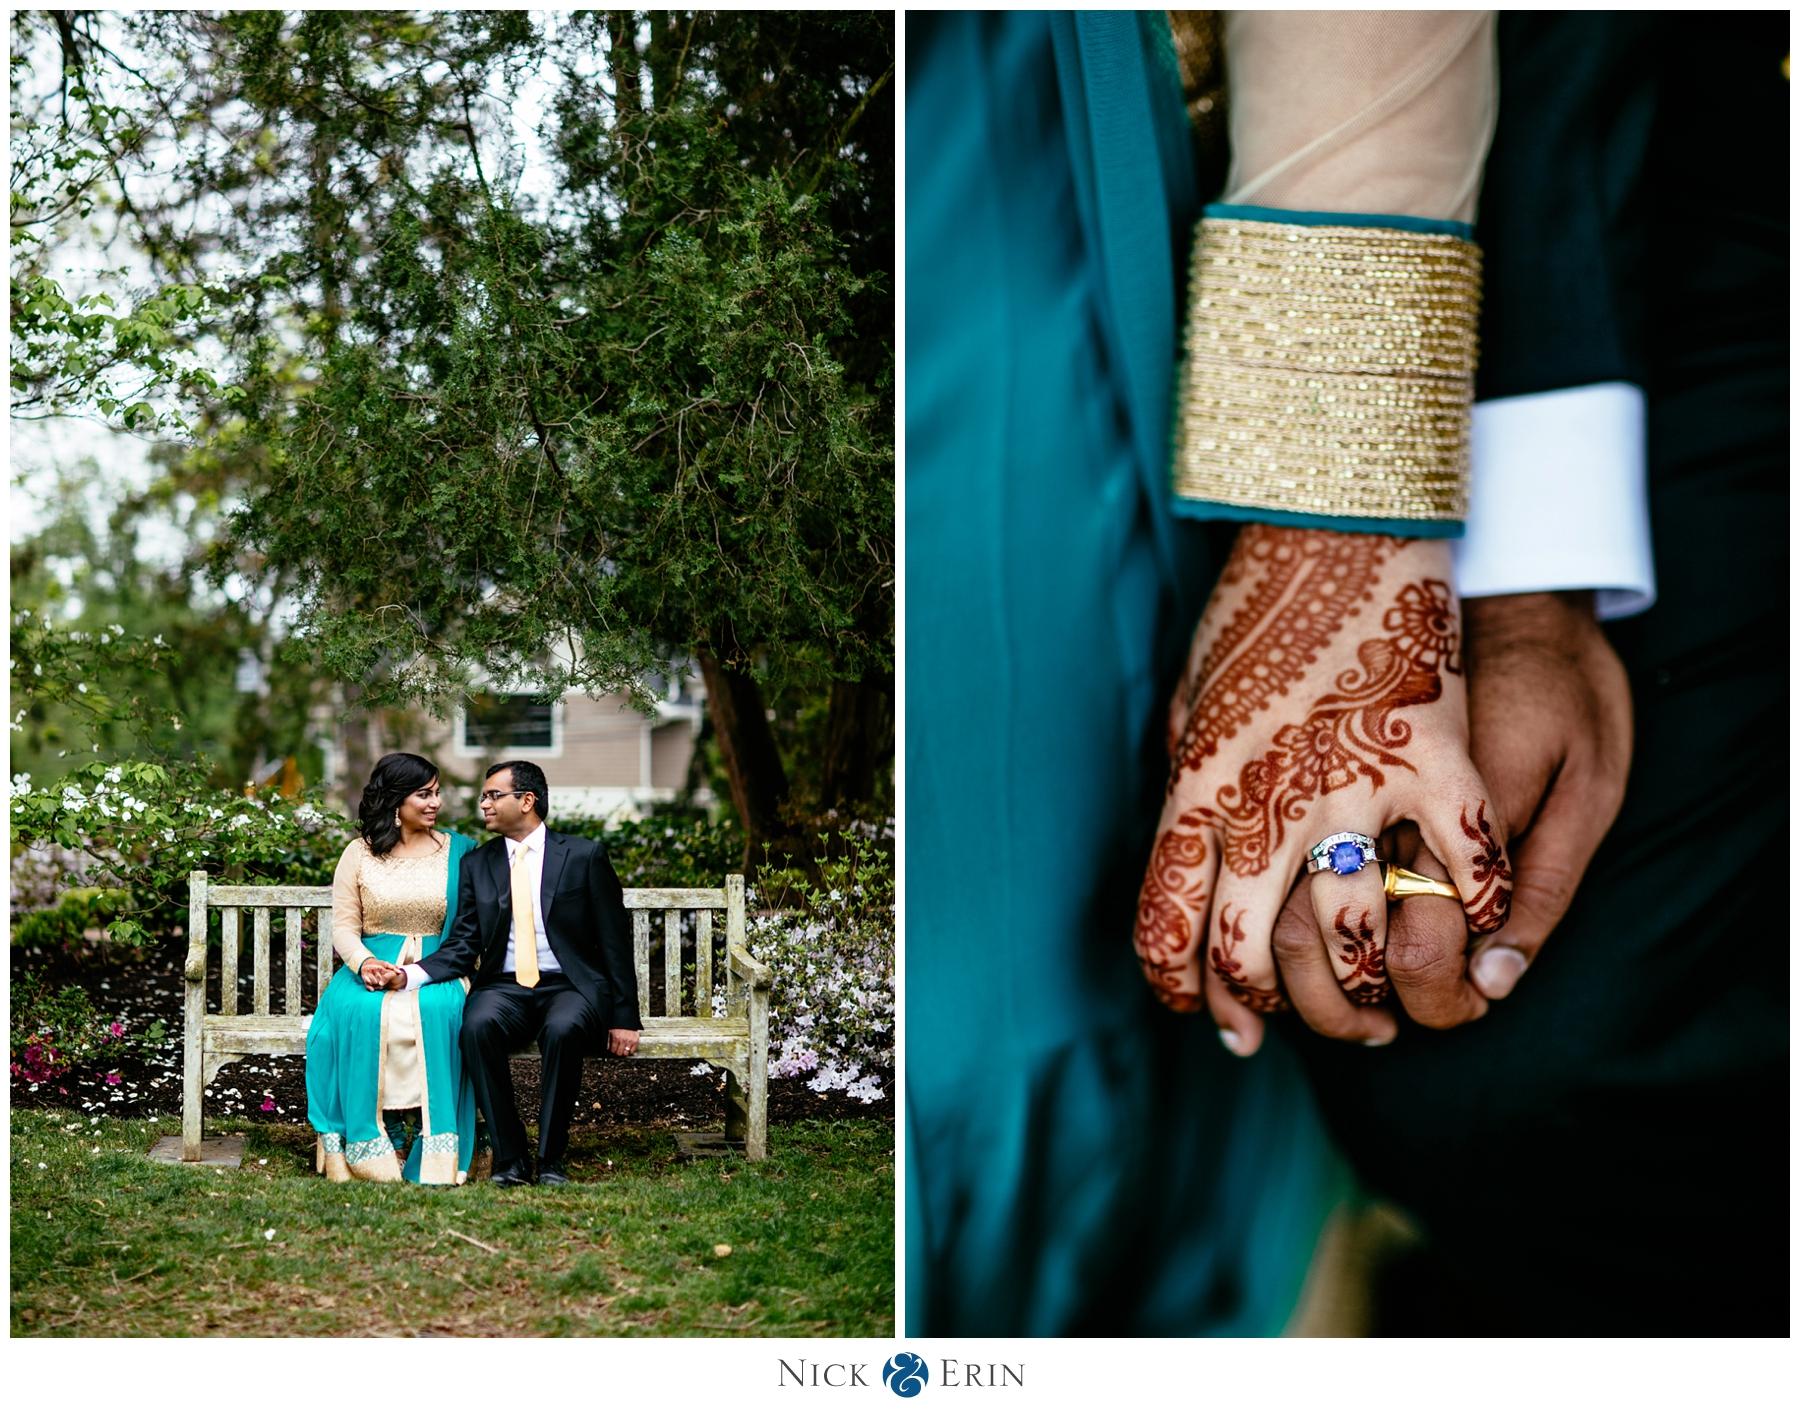 Donner_Photography_Arlington VA Wedding_Amrith and Aleefia_0003